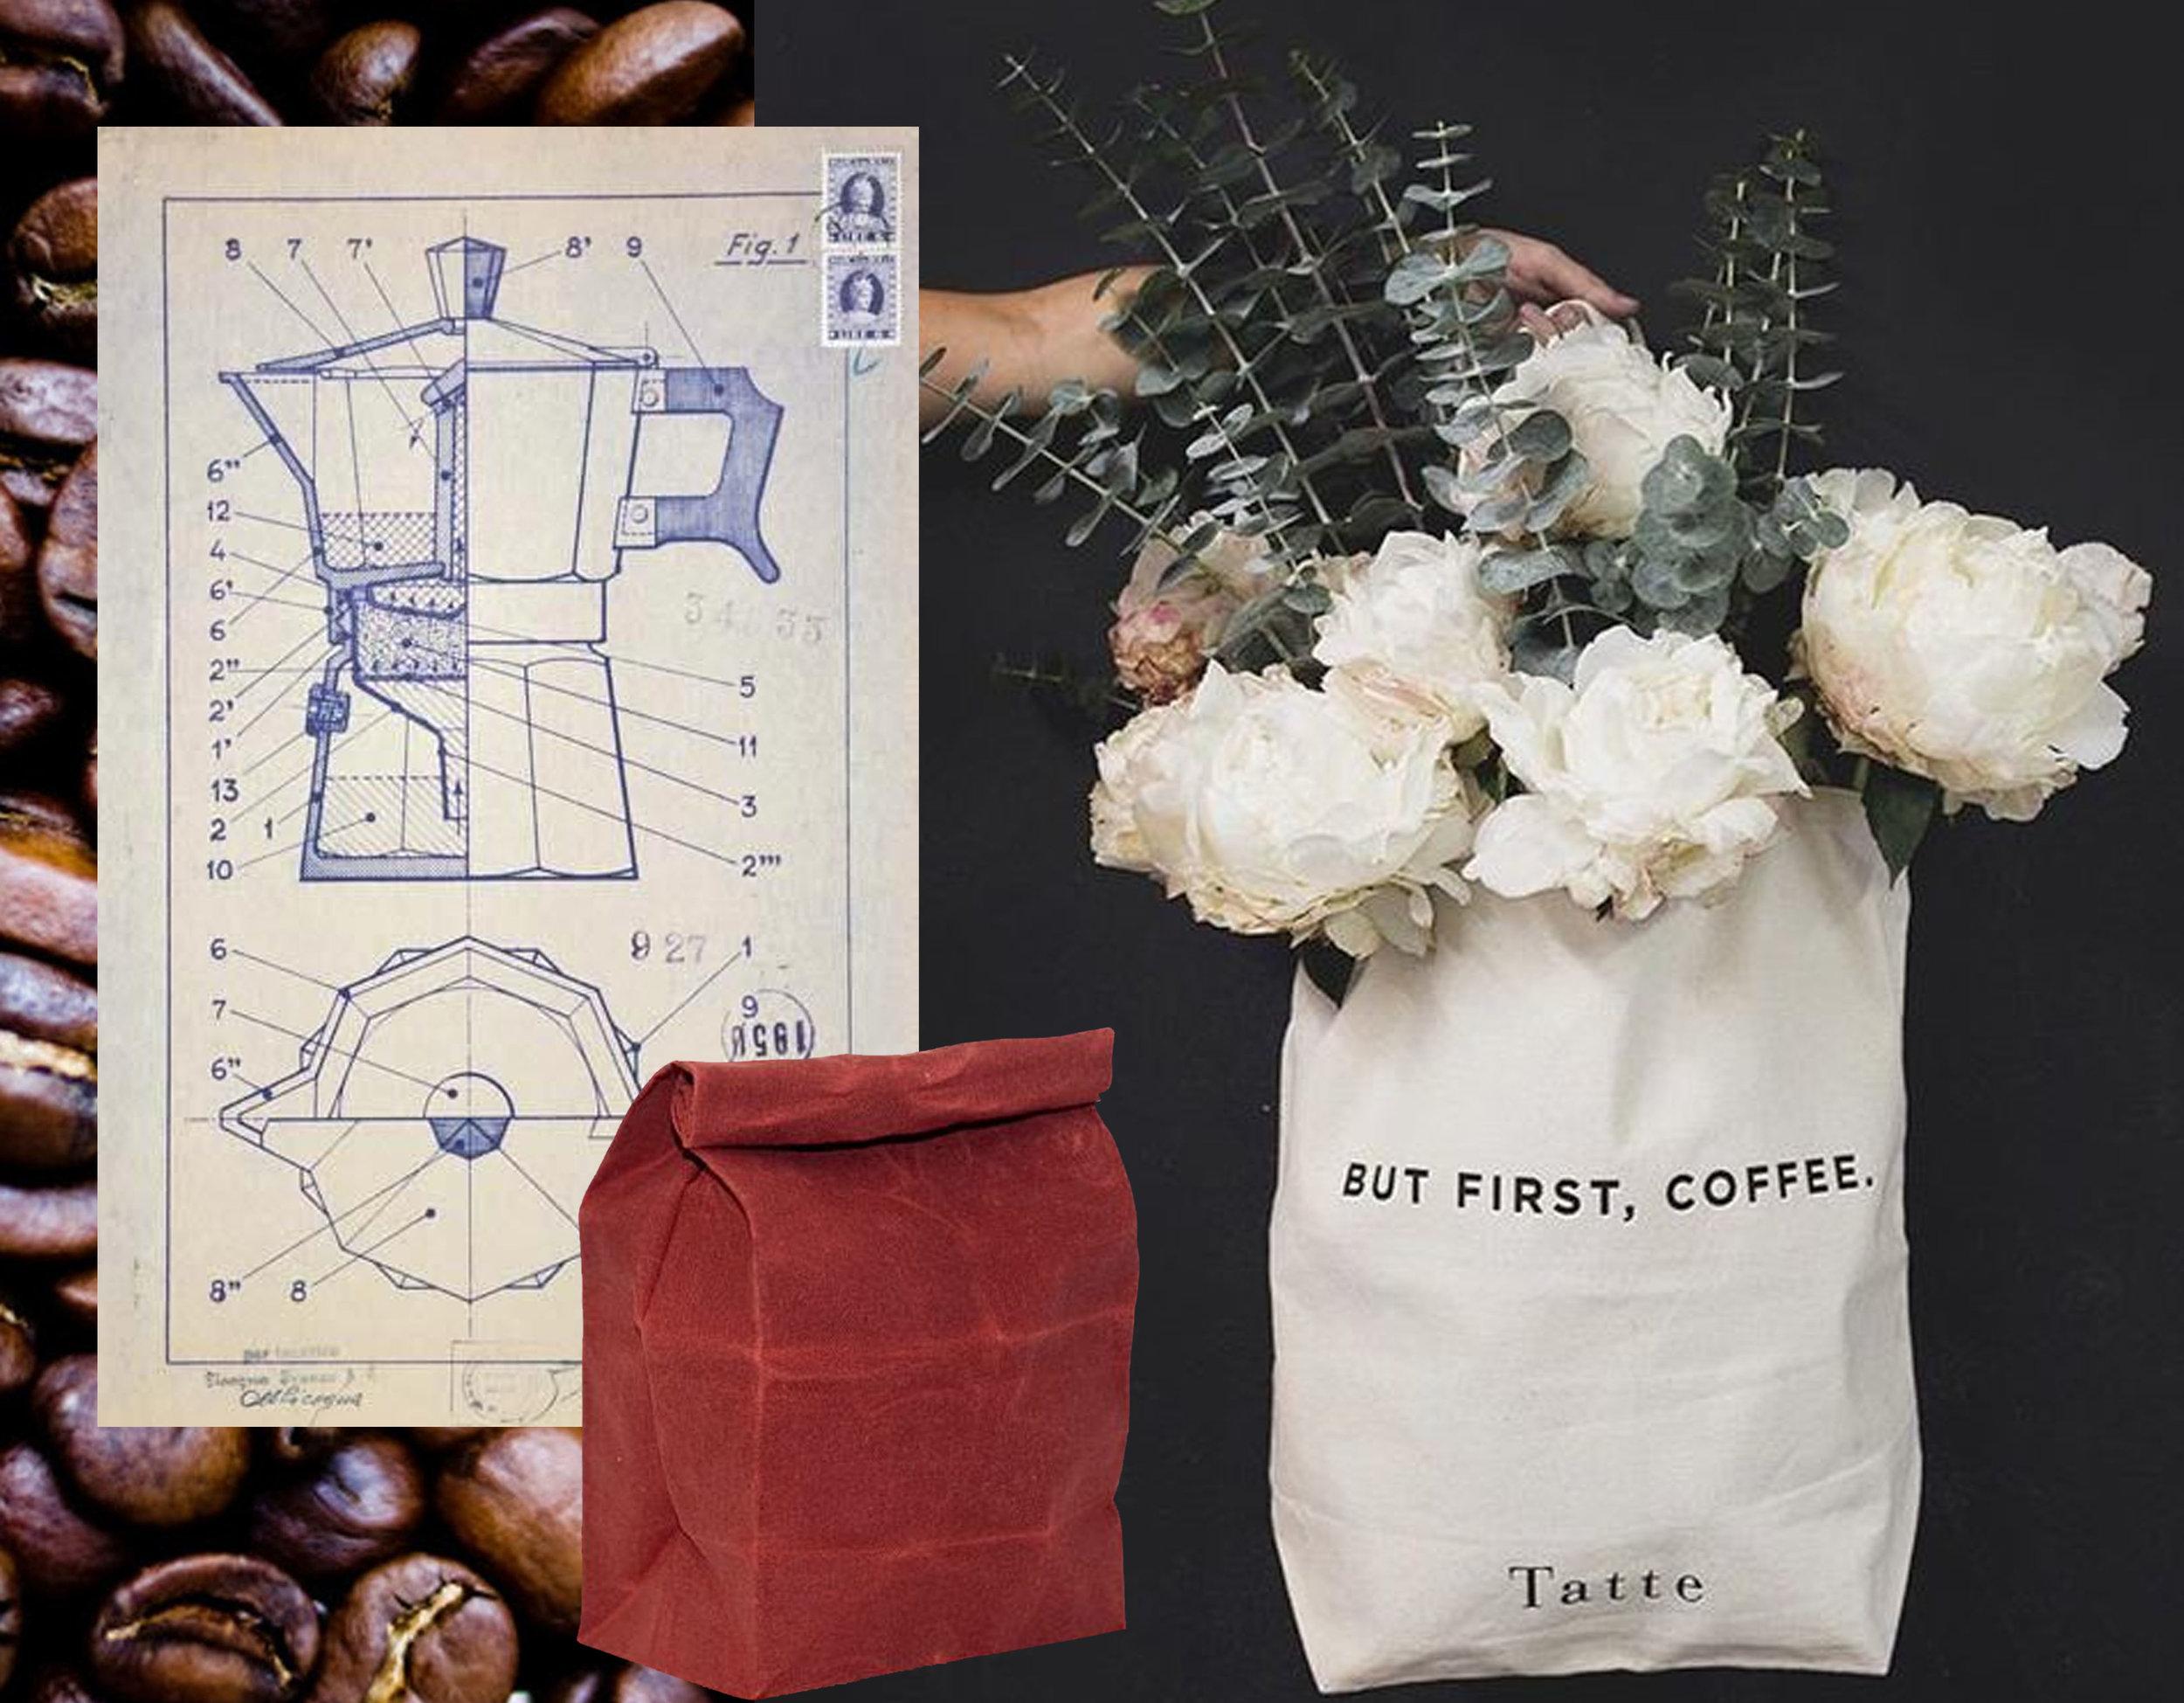 image coffee beans via  Bon Appetit  - Alfonso Bialetti coffee maker design via  L'Aragosta  - lunch bag in waxed cotton  Waam Industries  - But First, Coffee via  Sinsdesign